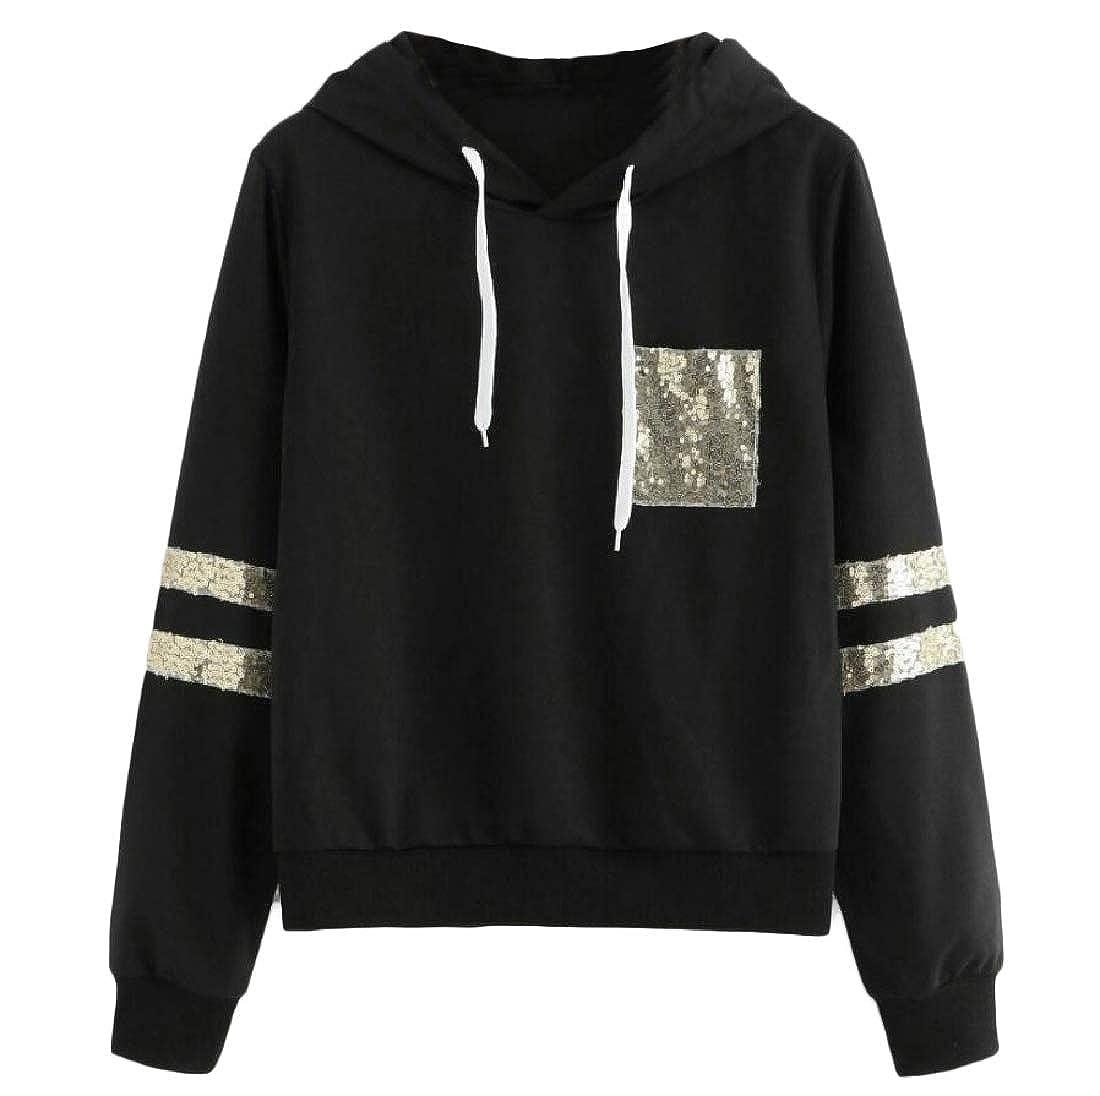 Sequin Splicing Loose Fit Basic Classics Pullover Sweatshirt